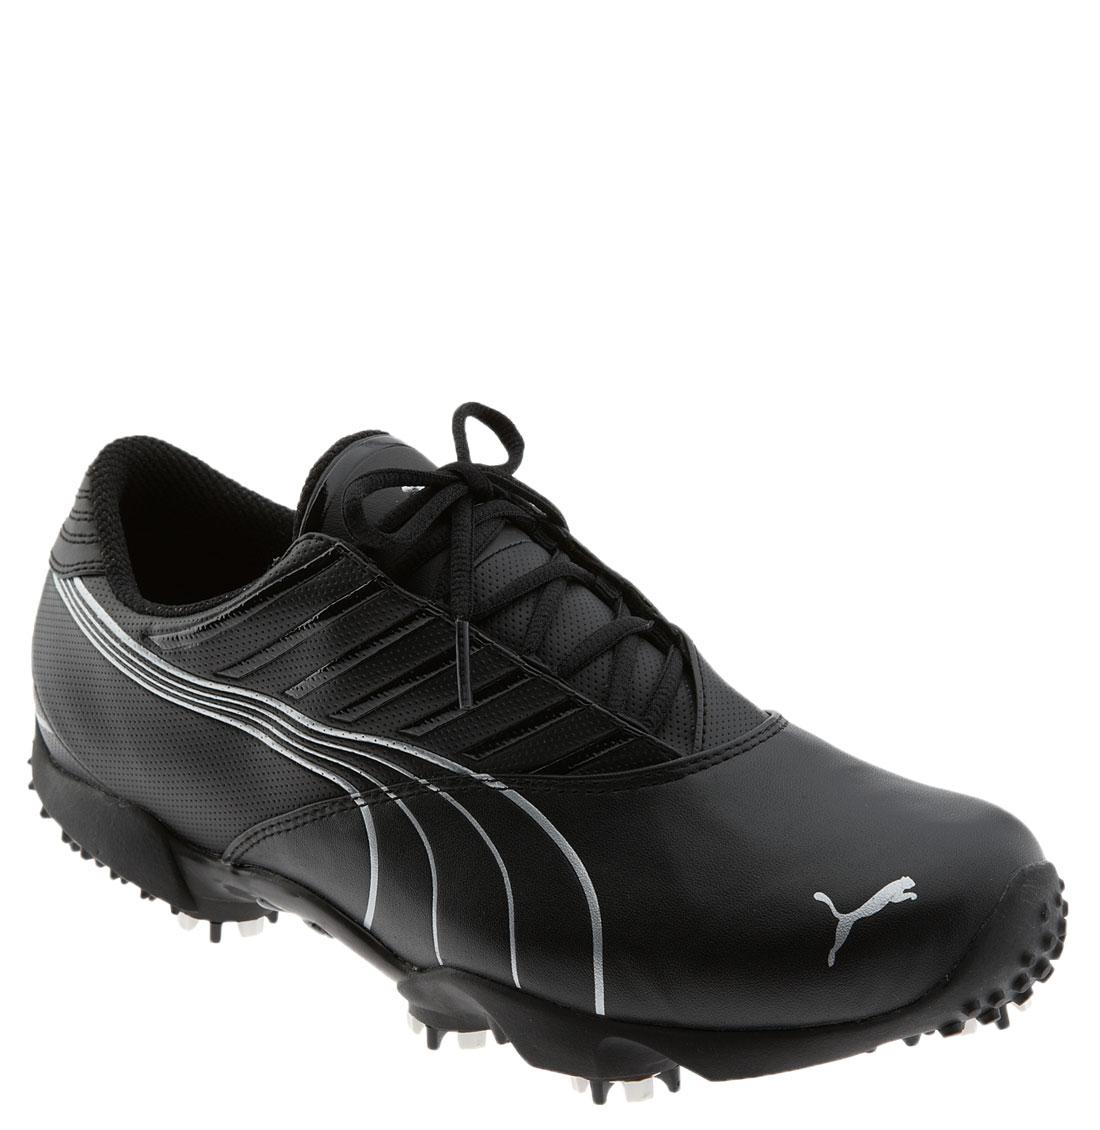 Puma Saddle Golf Shoes